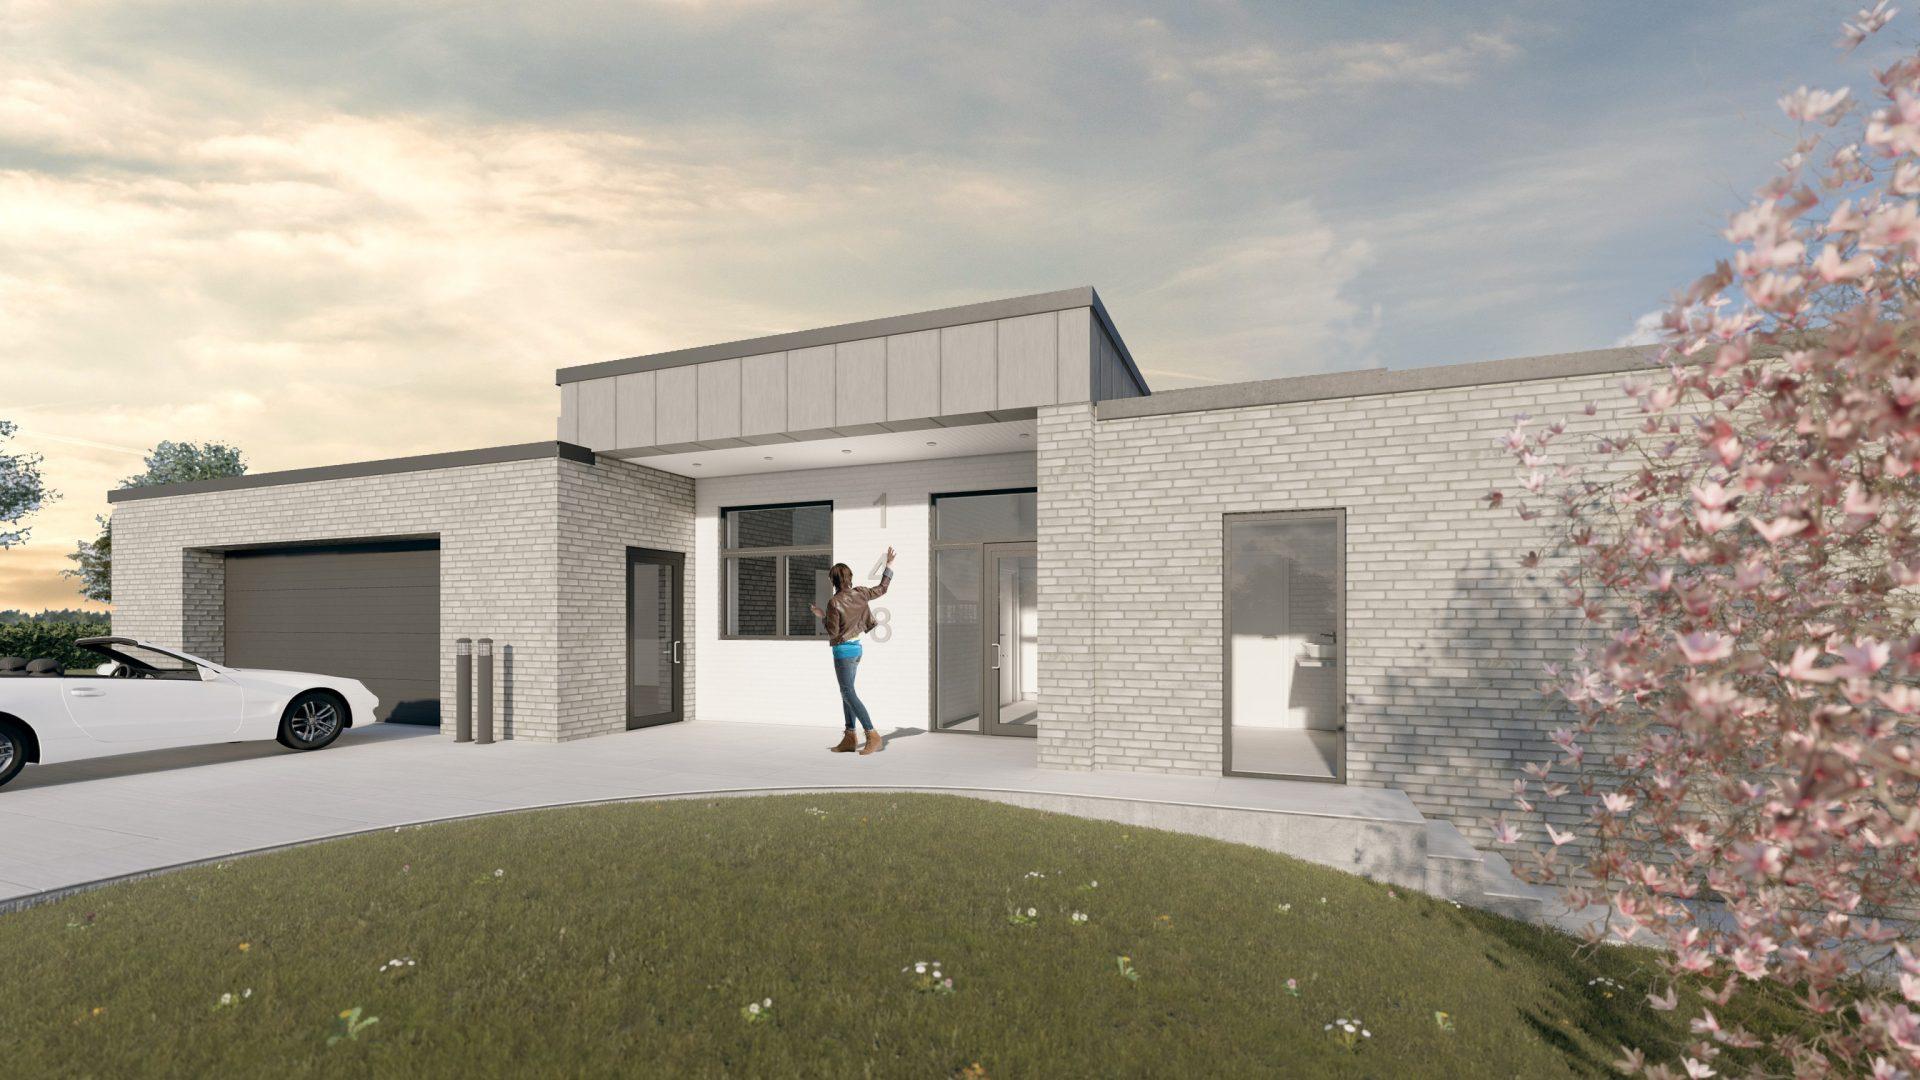 Nyt hus i støvring 05